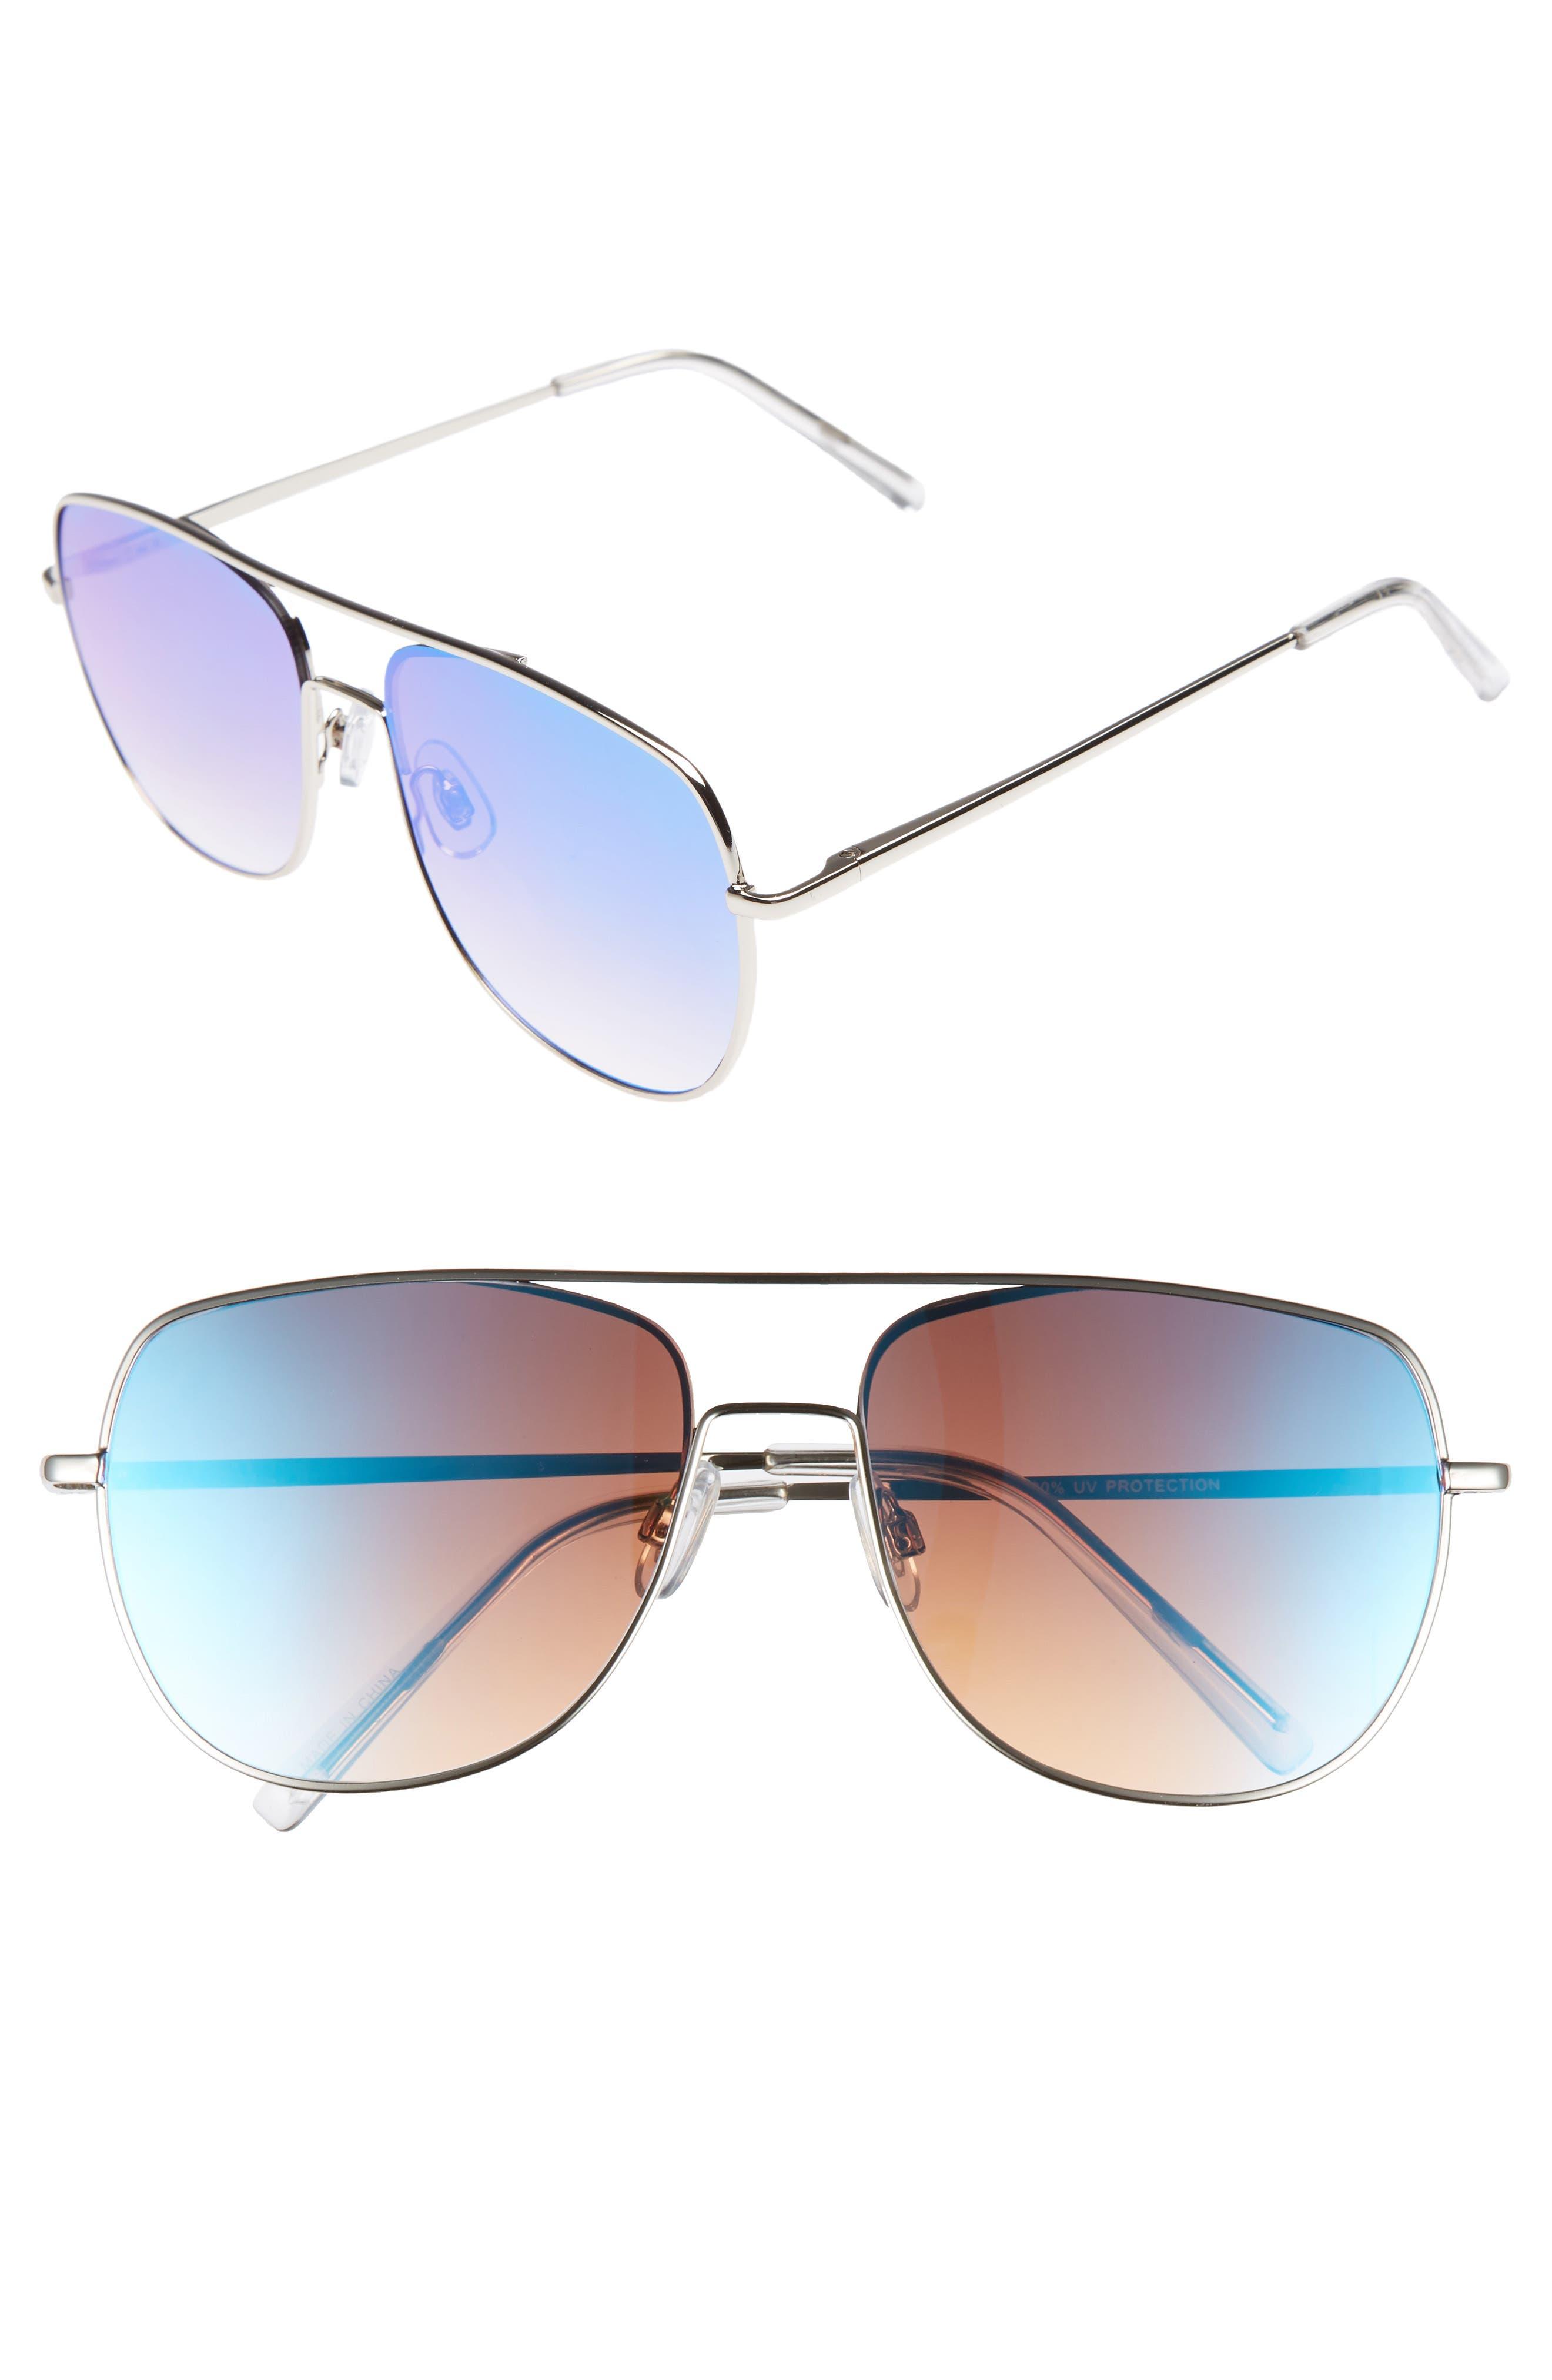 58mm Aviator Sunglasses,                             Main thumbnail 1, color,                             040